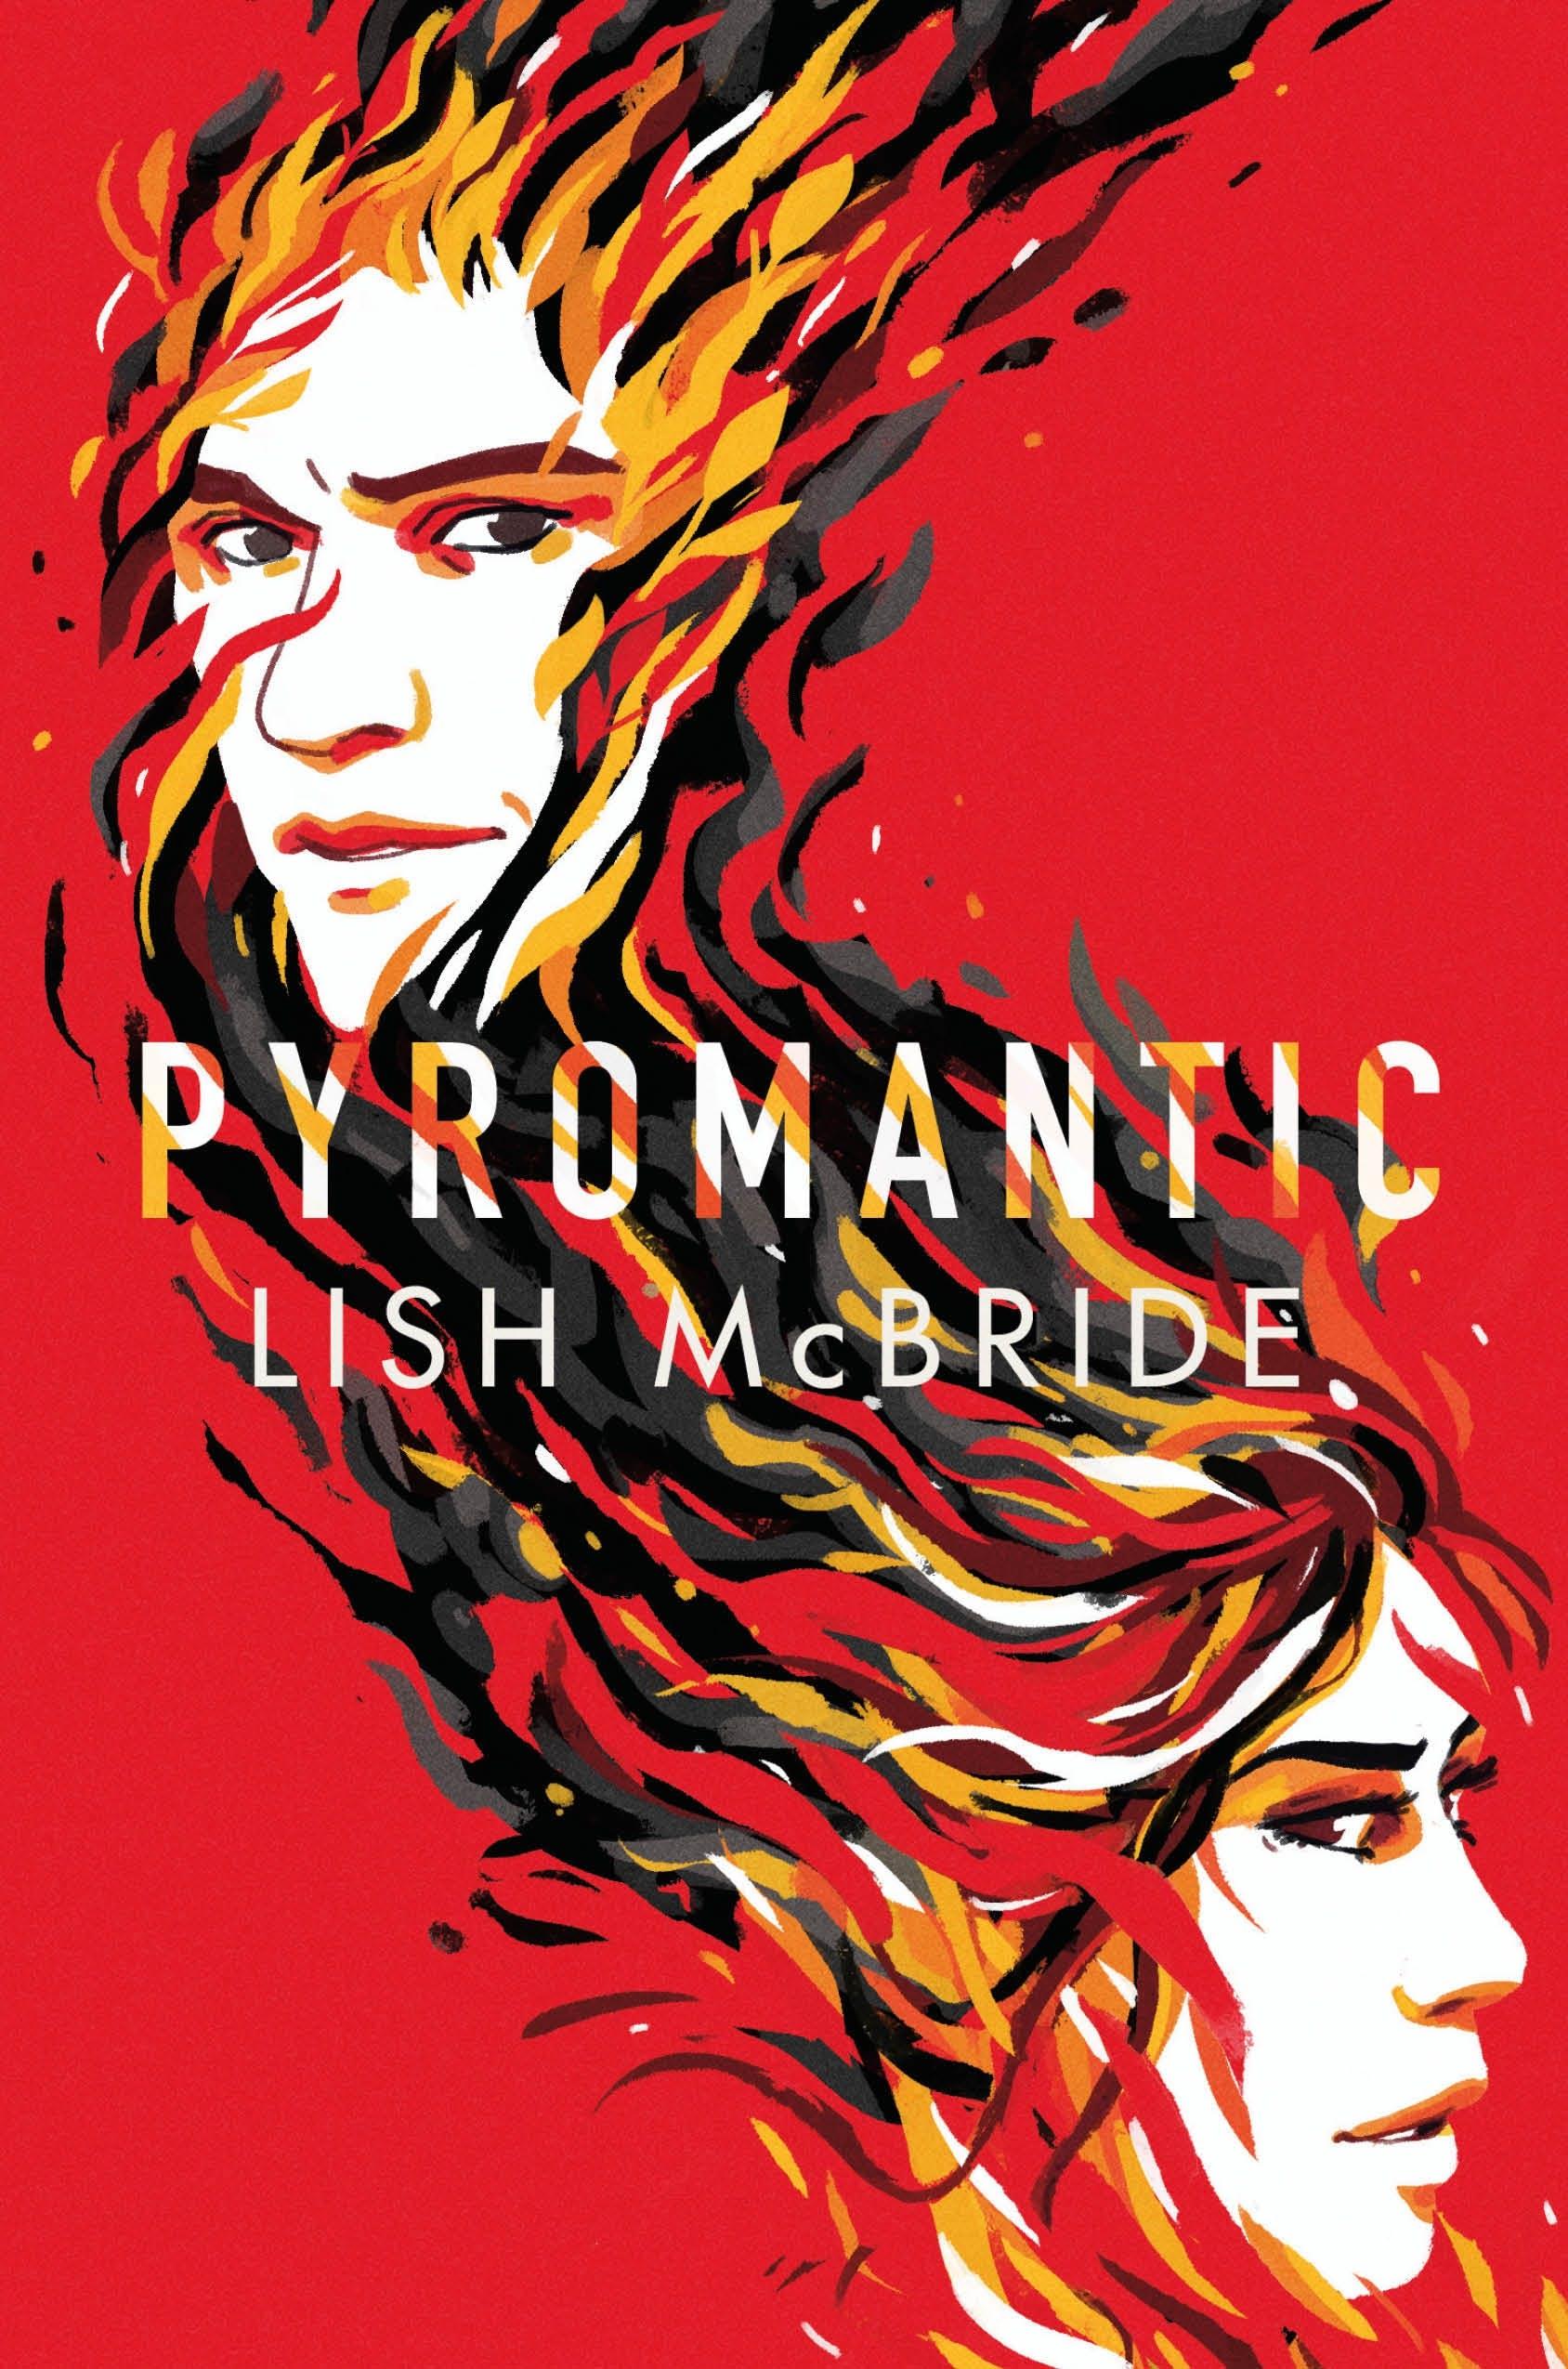 Image of Pyromantic